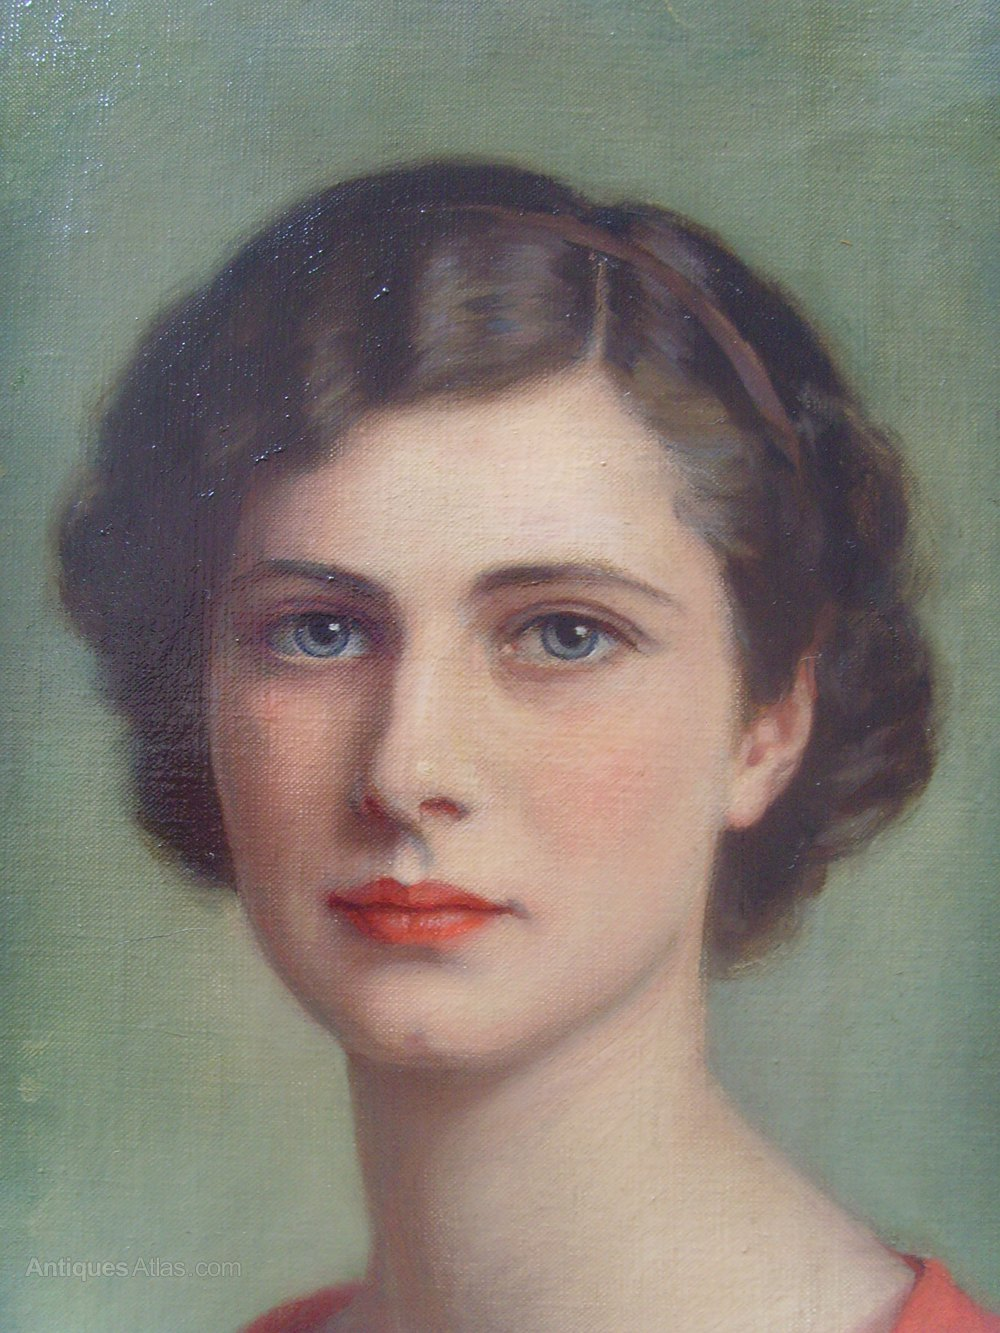 Antiques Atlas - Oil Painting Portrait Of Averil Kingston ...